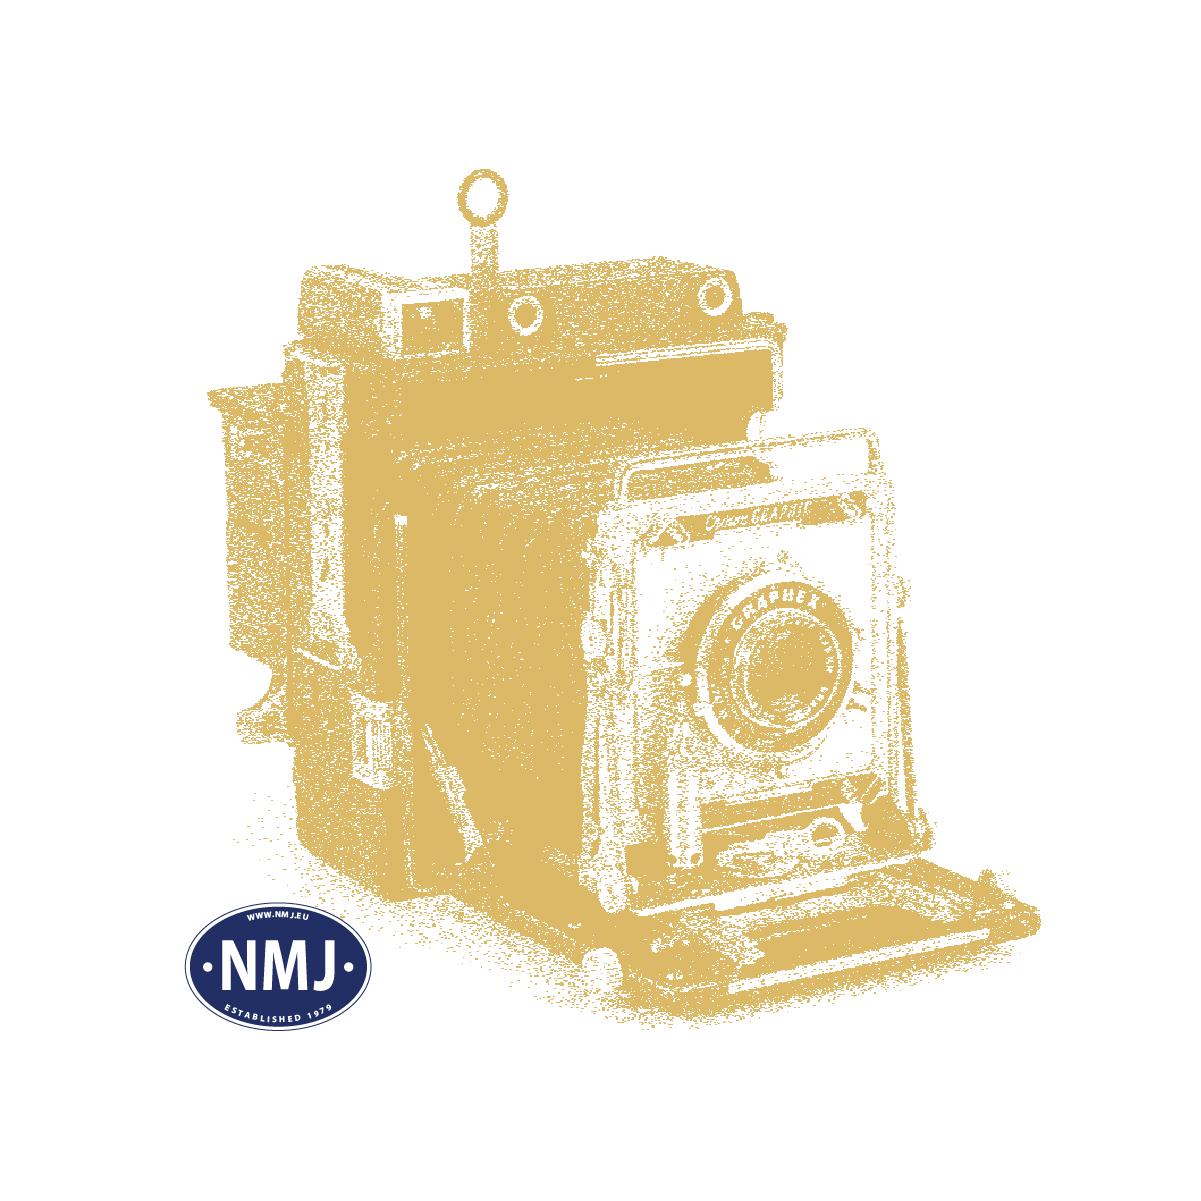 NMJT90015 - NMJ Topline NSB Di3a 616, Nydesign, DC